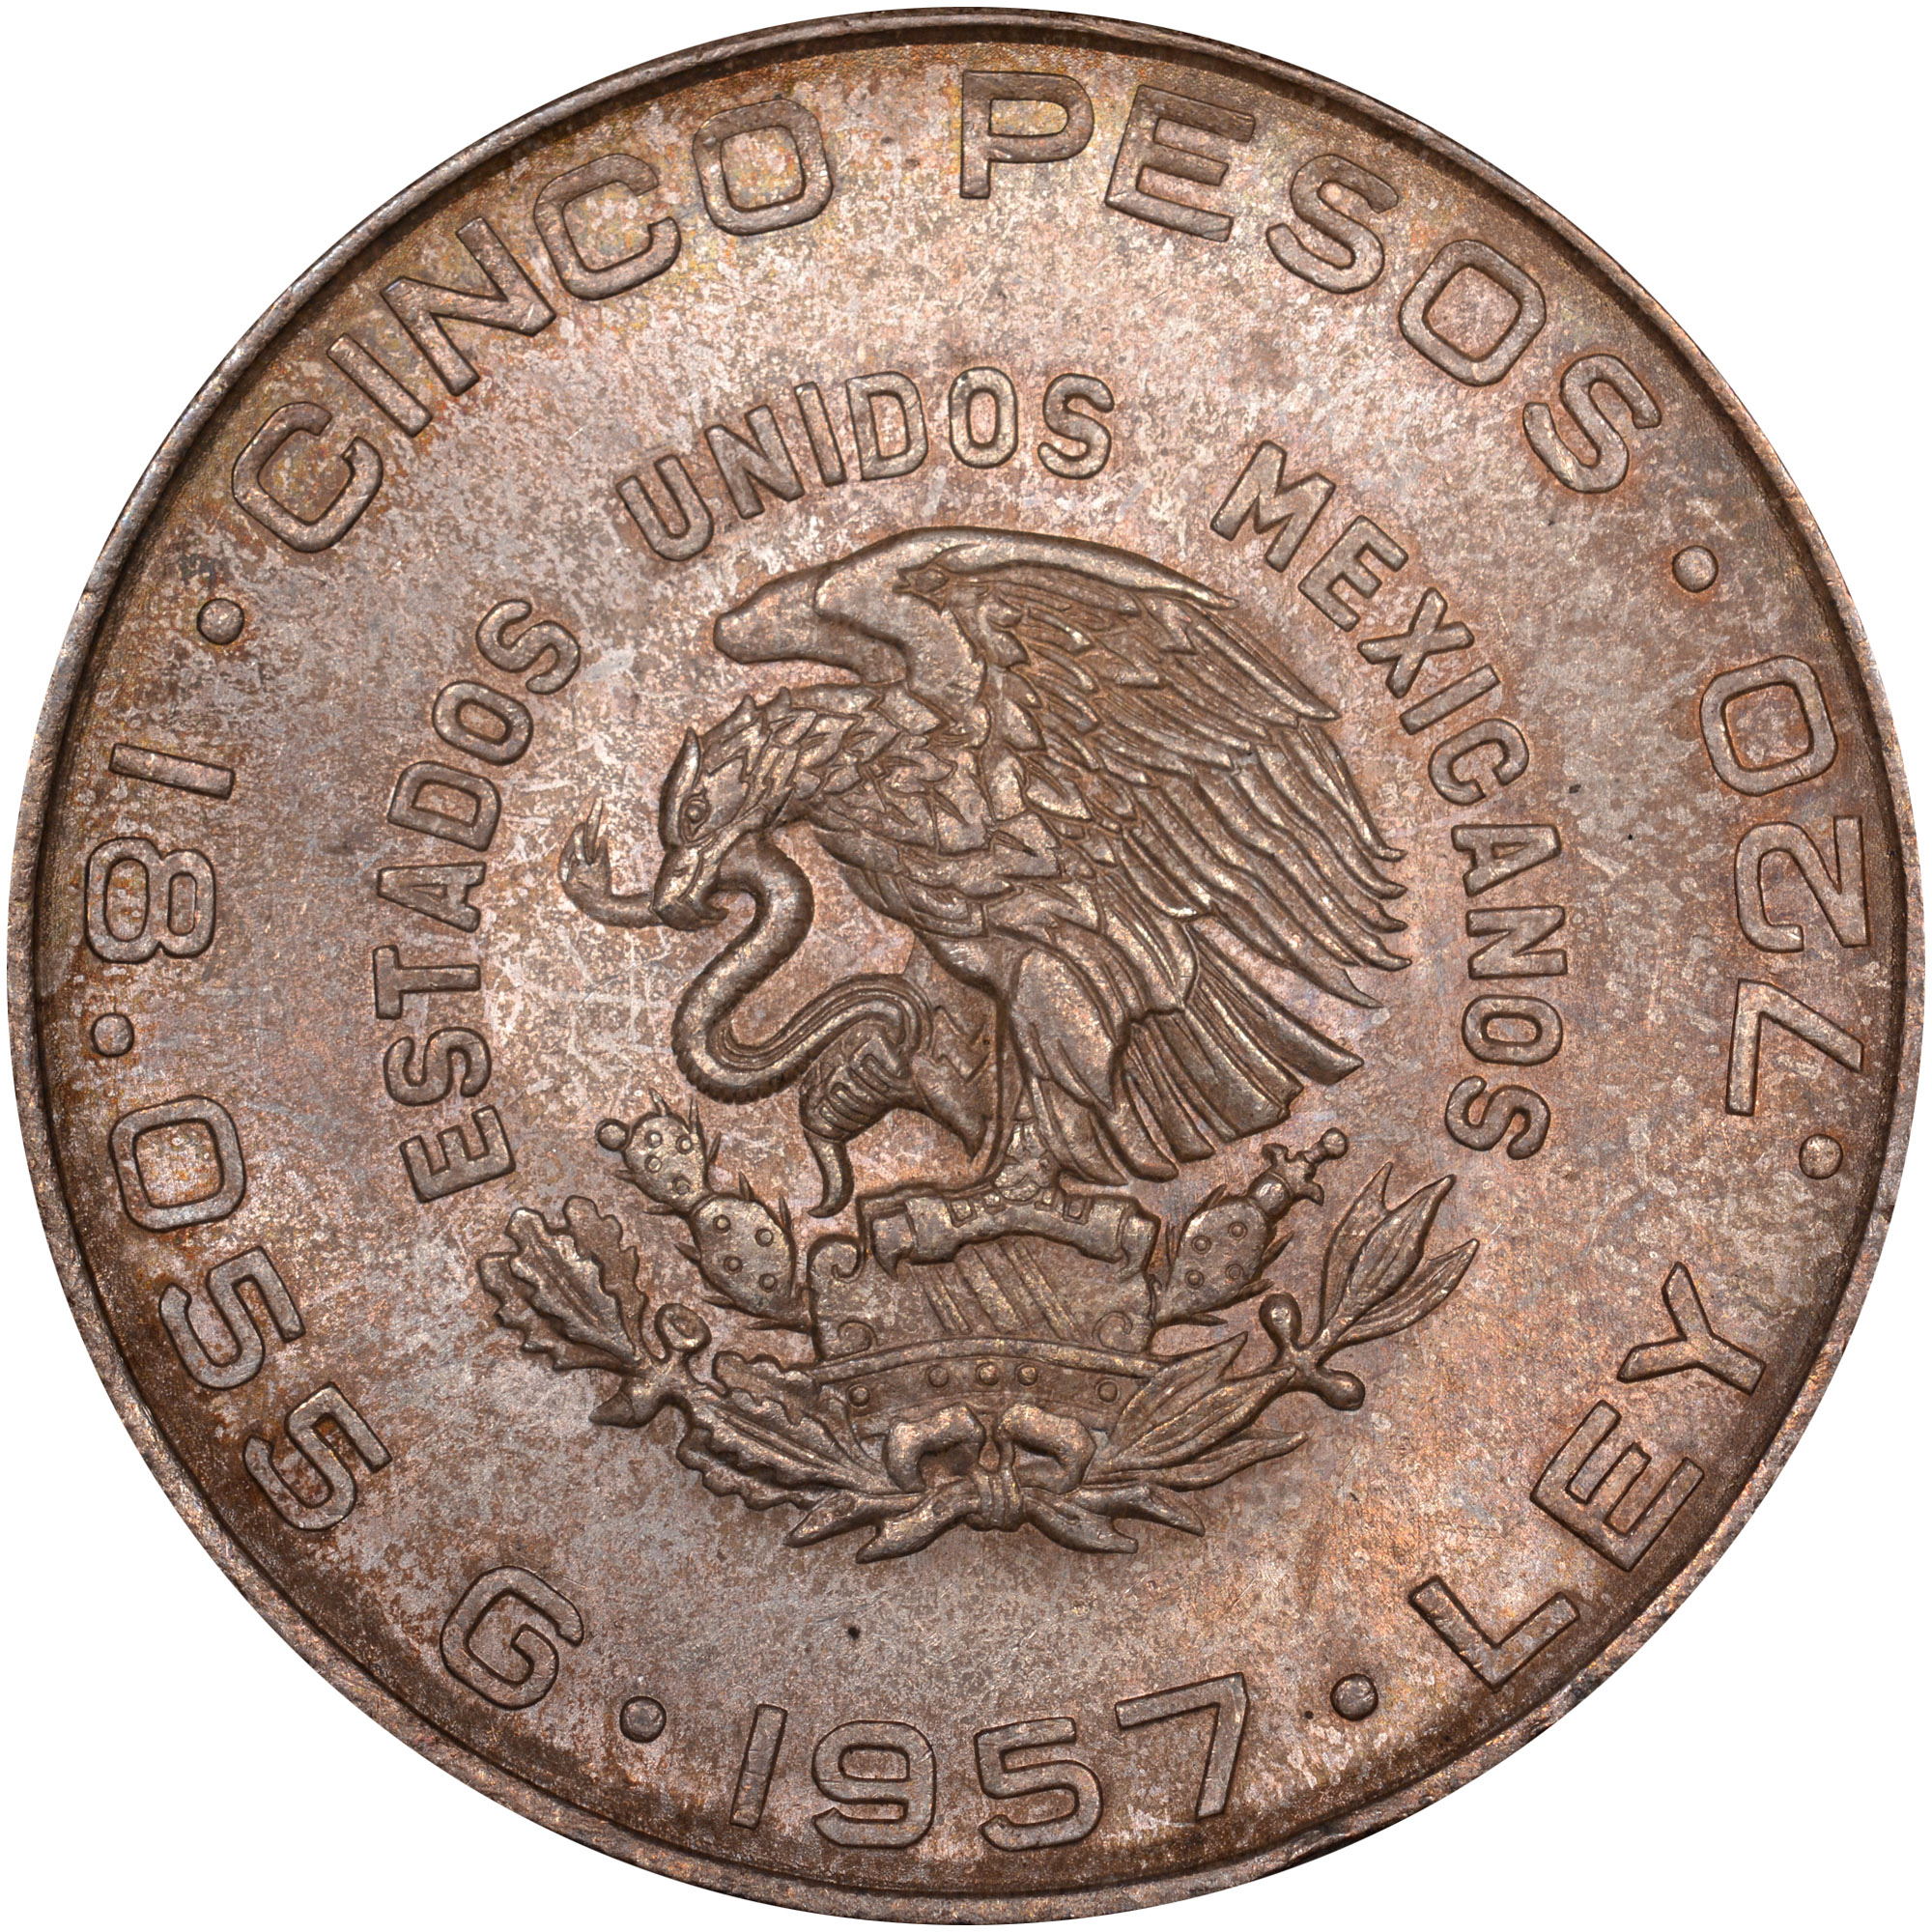 1955-1957 Mexico 5 Pesos KM 469 Prices & Values | NGC